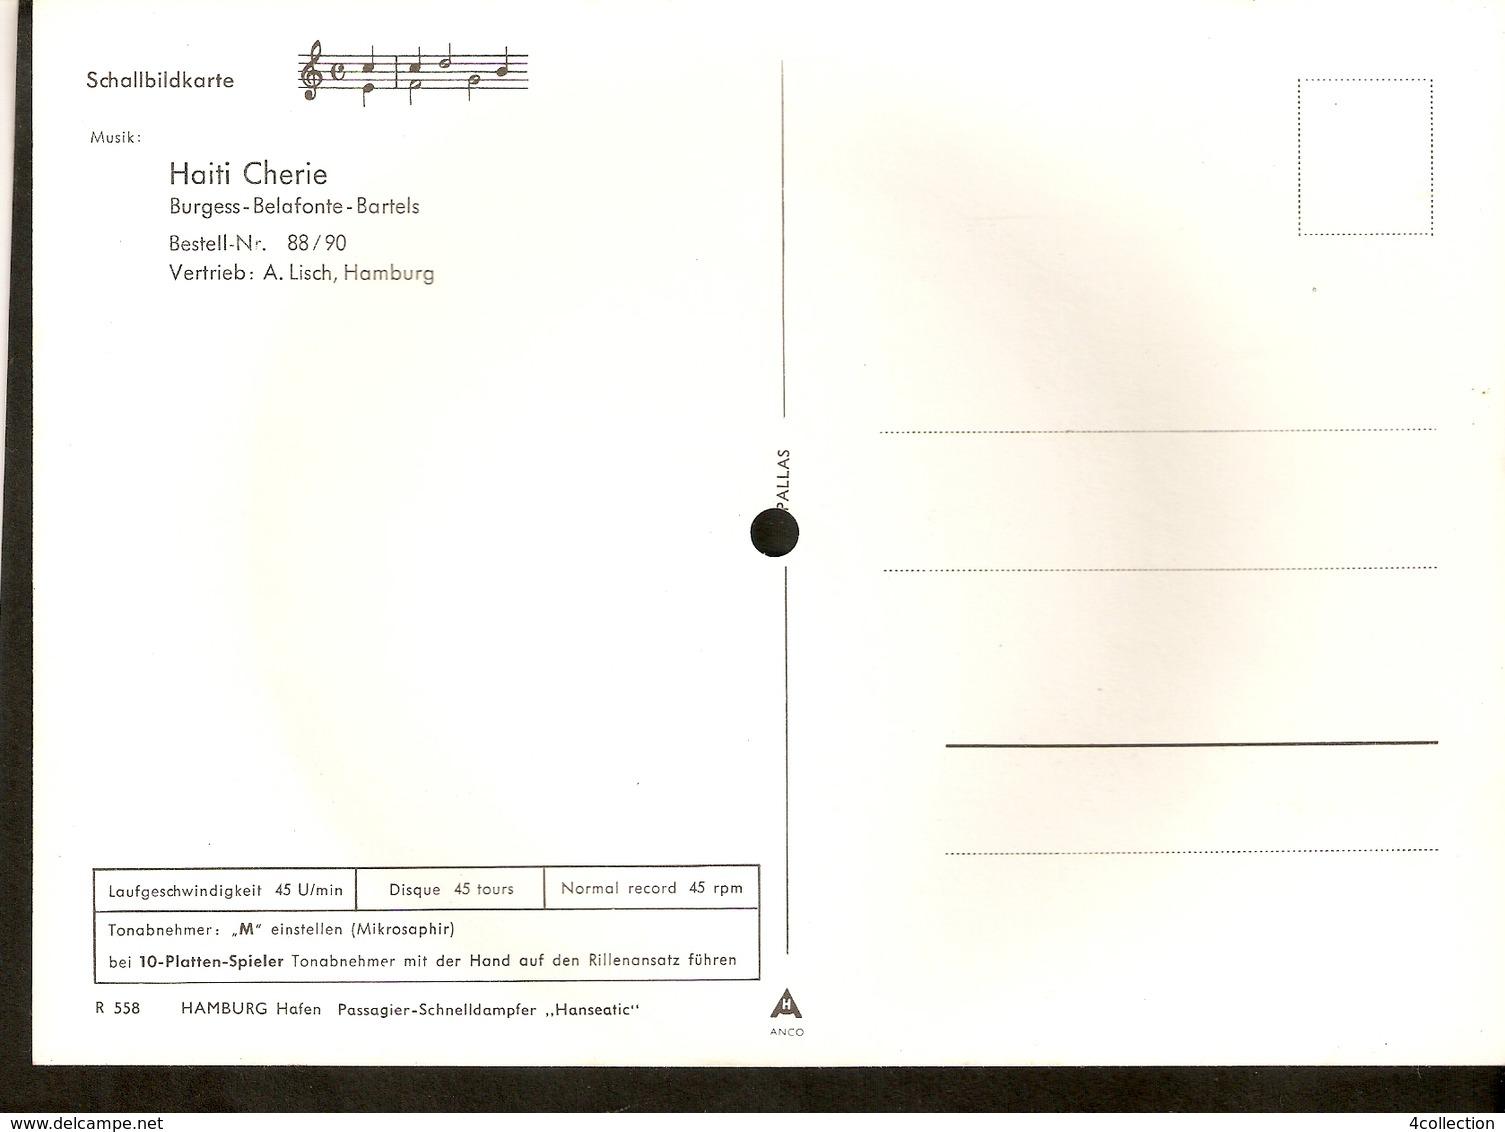 Old Musical 45rpm Record Postcard HAITI CHERIE Hamburg Hafen Hanseatic Schallbildkarte - Vinyl Records